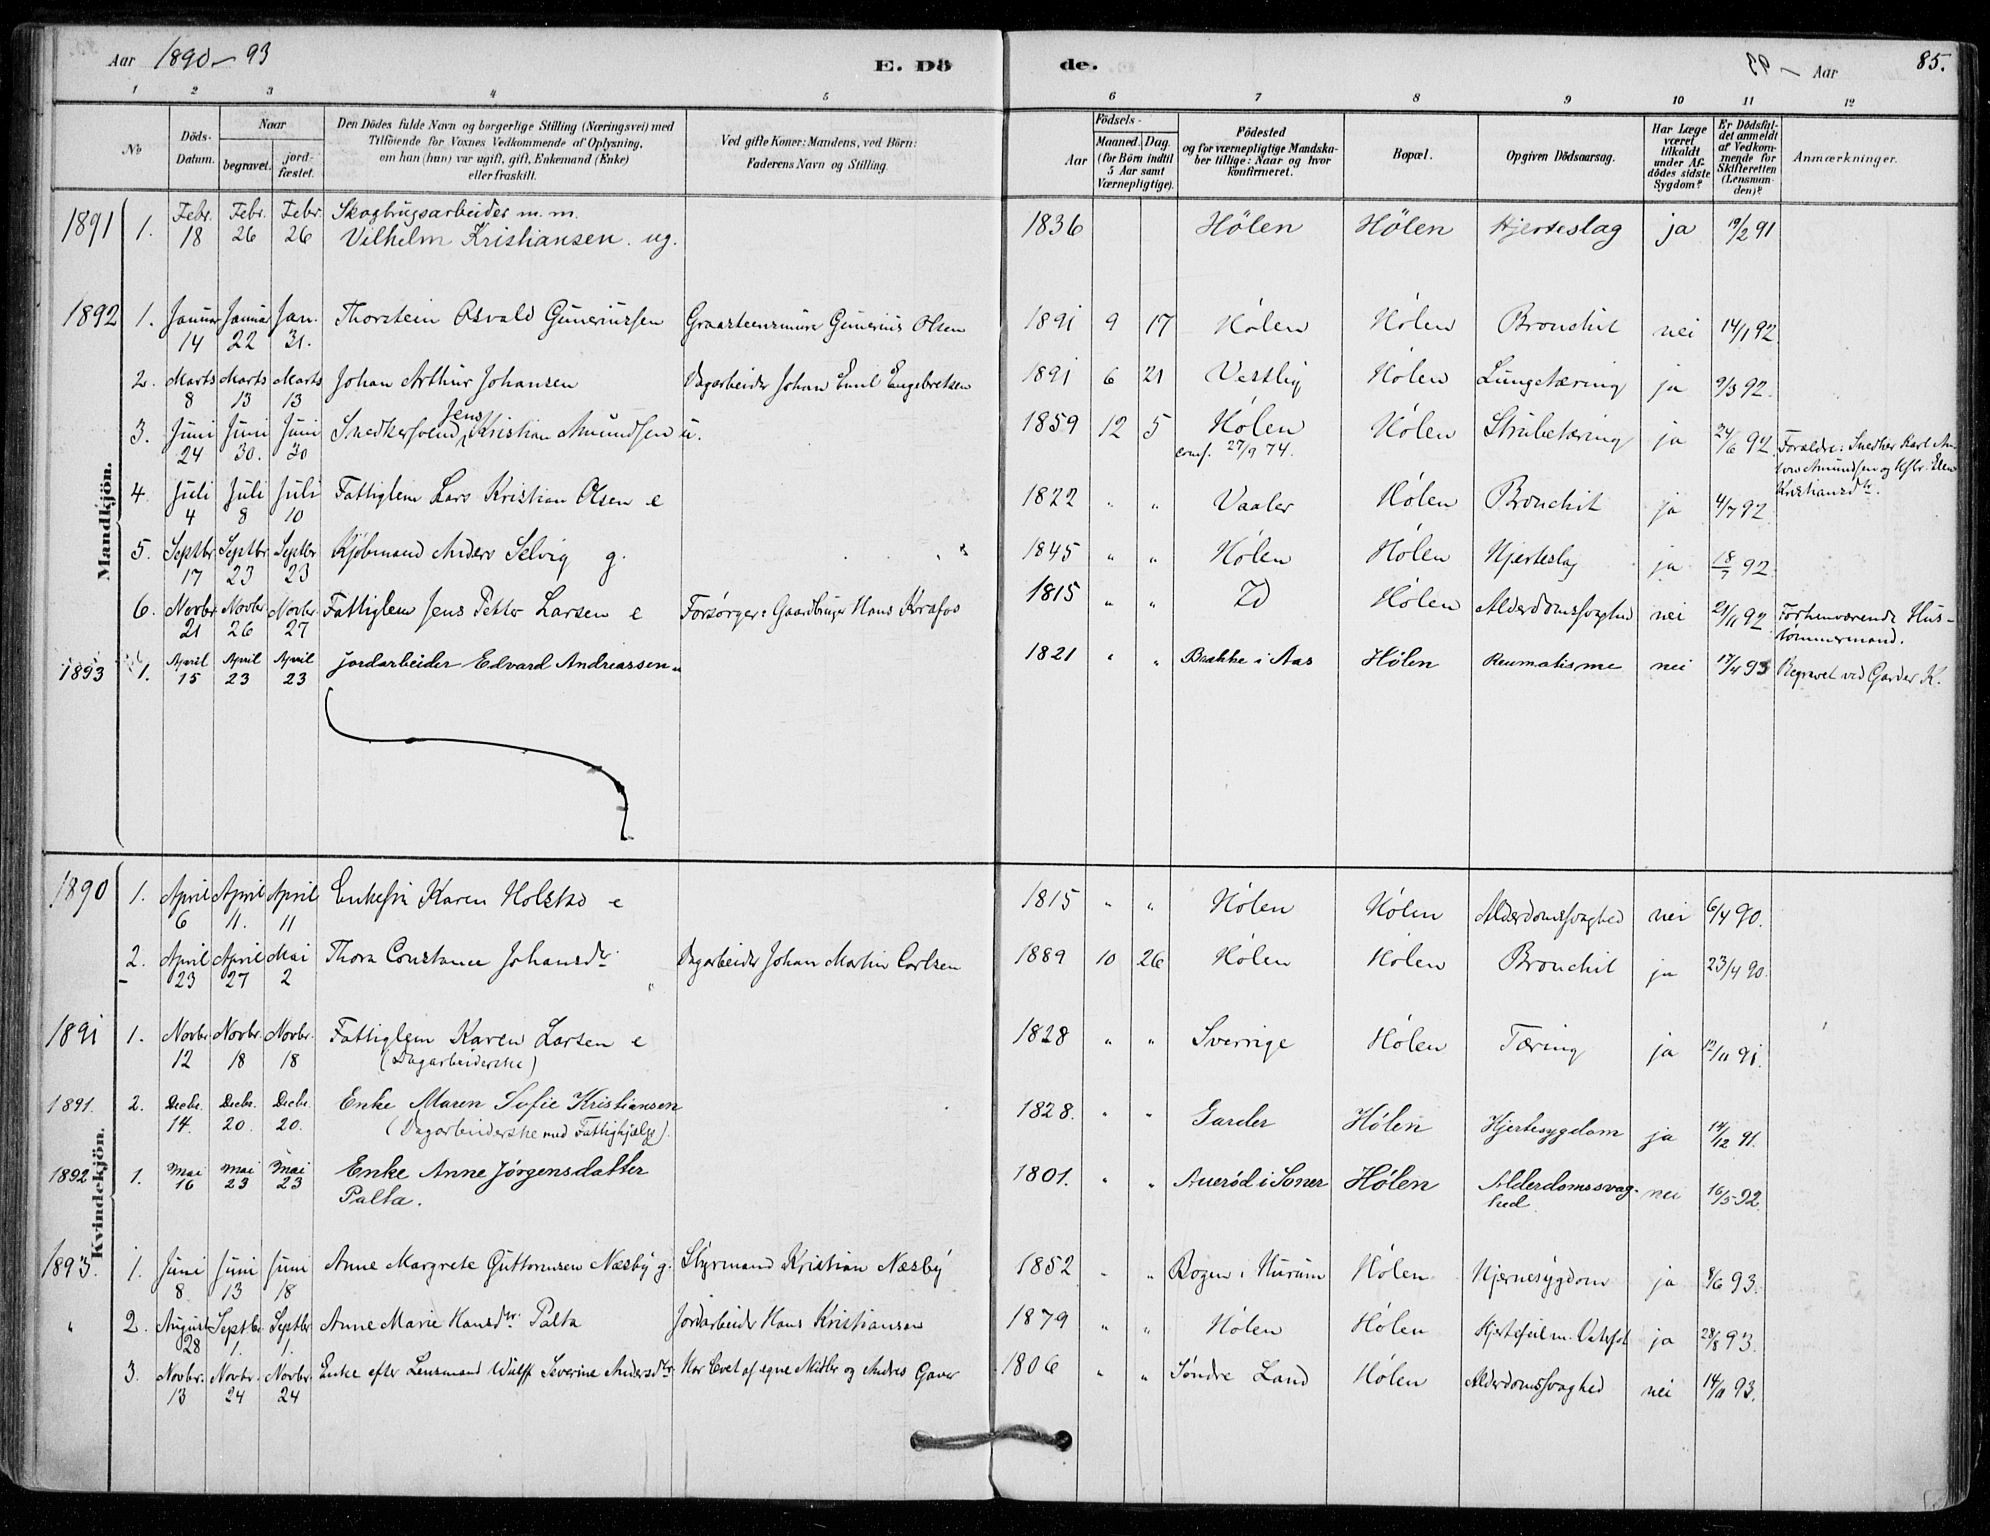 SAO, Vestby prestekontor Kirkebøker, F/Fe/L0001: Ministerialbok nr. V 1, 1878-1931, s. 85